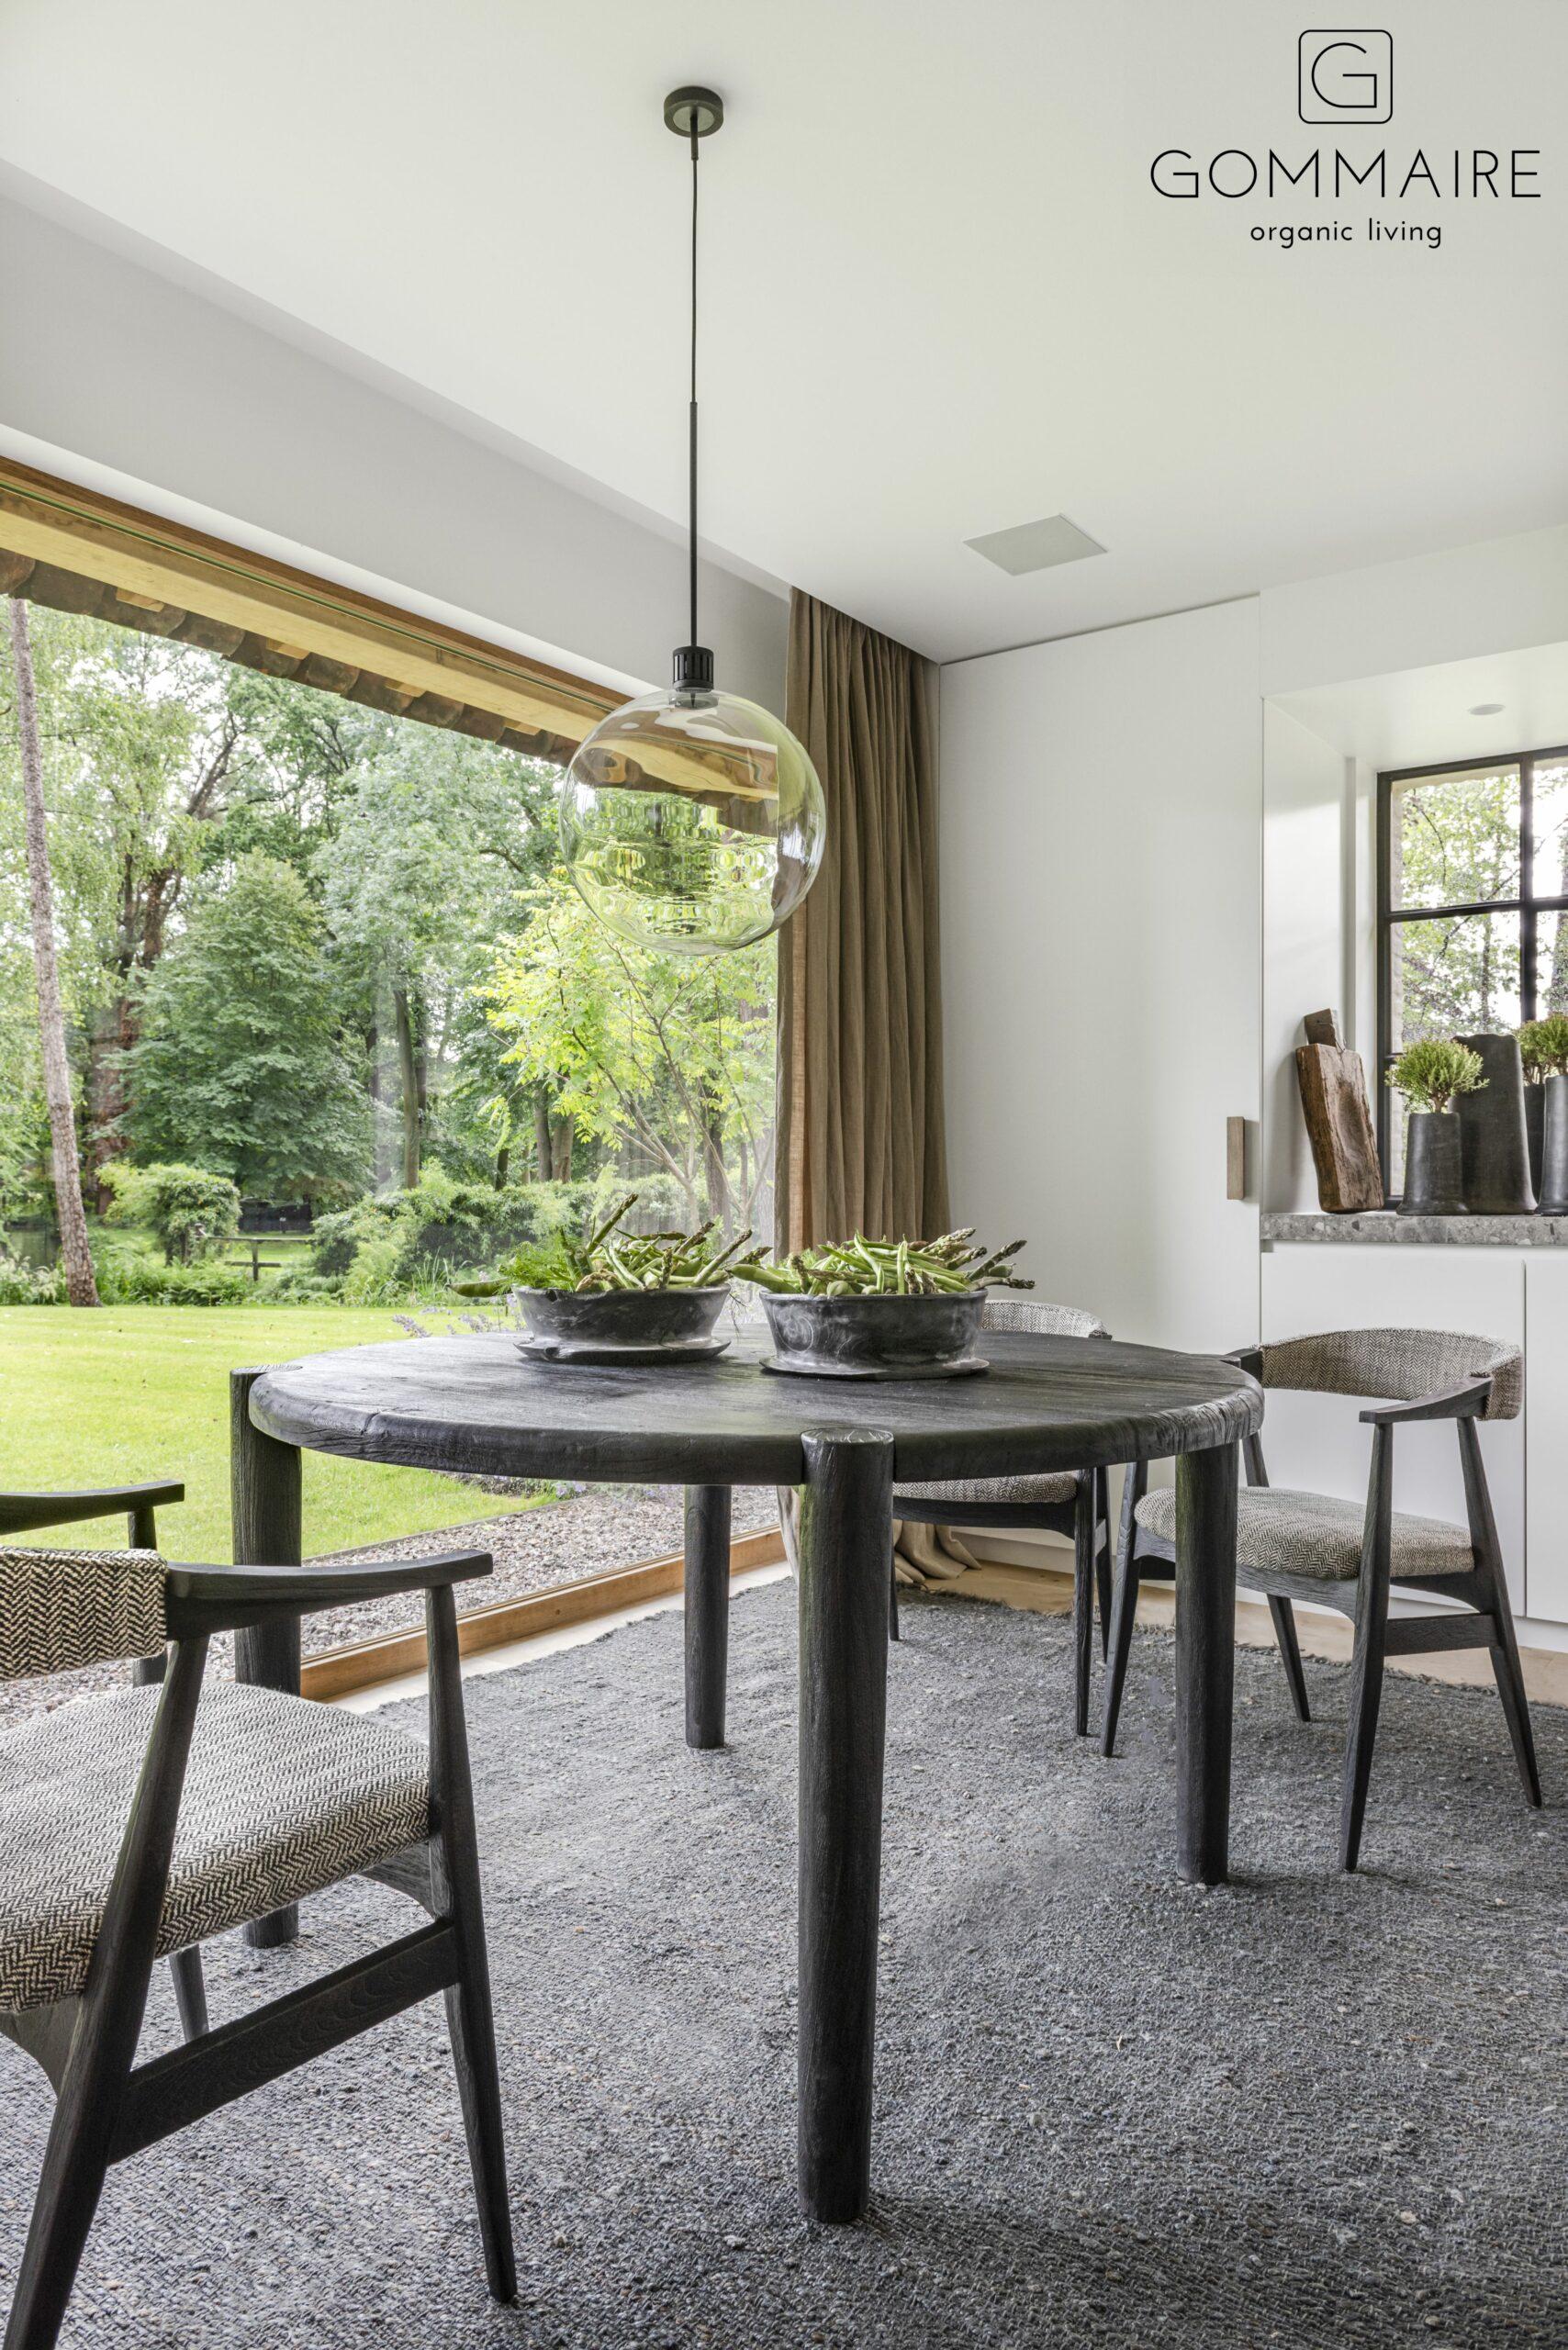 Gommaire-indoor-teak-furniture-round_table_floor